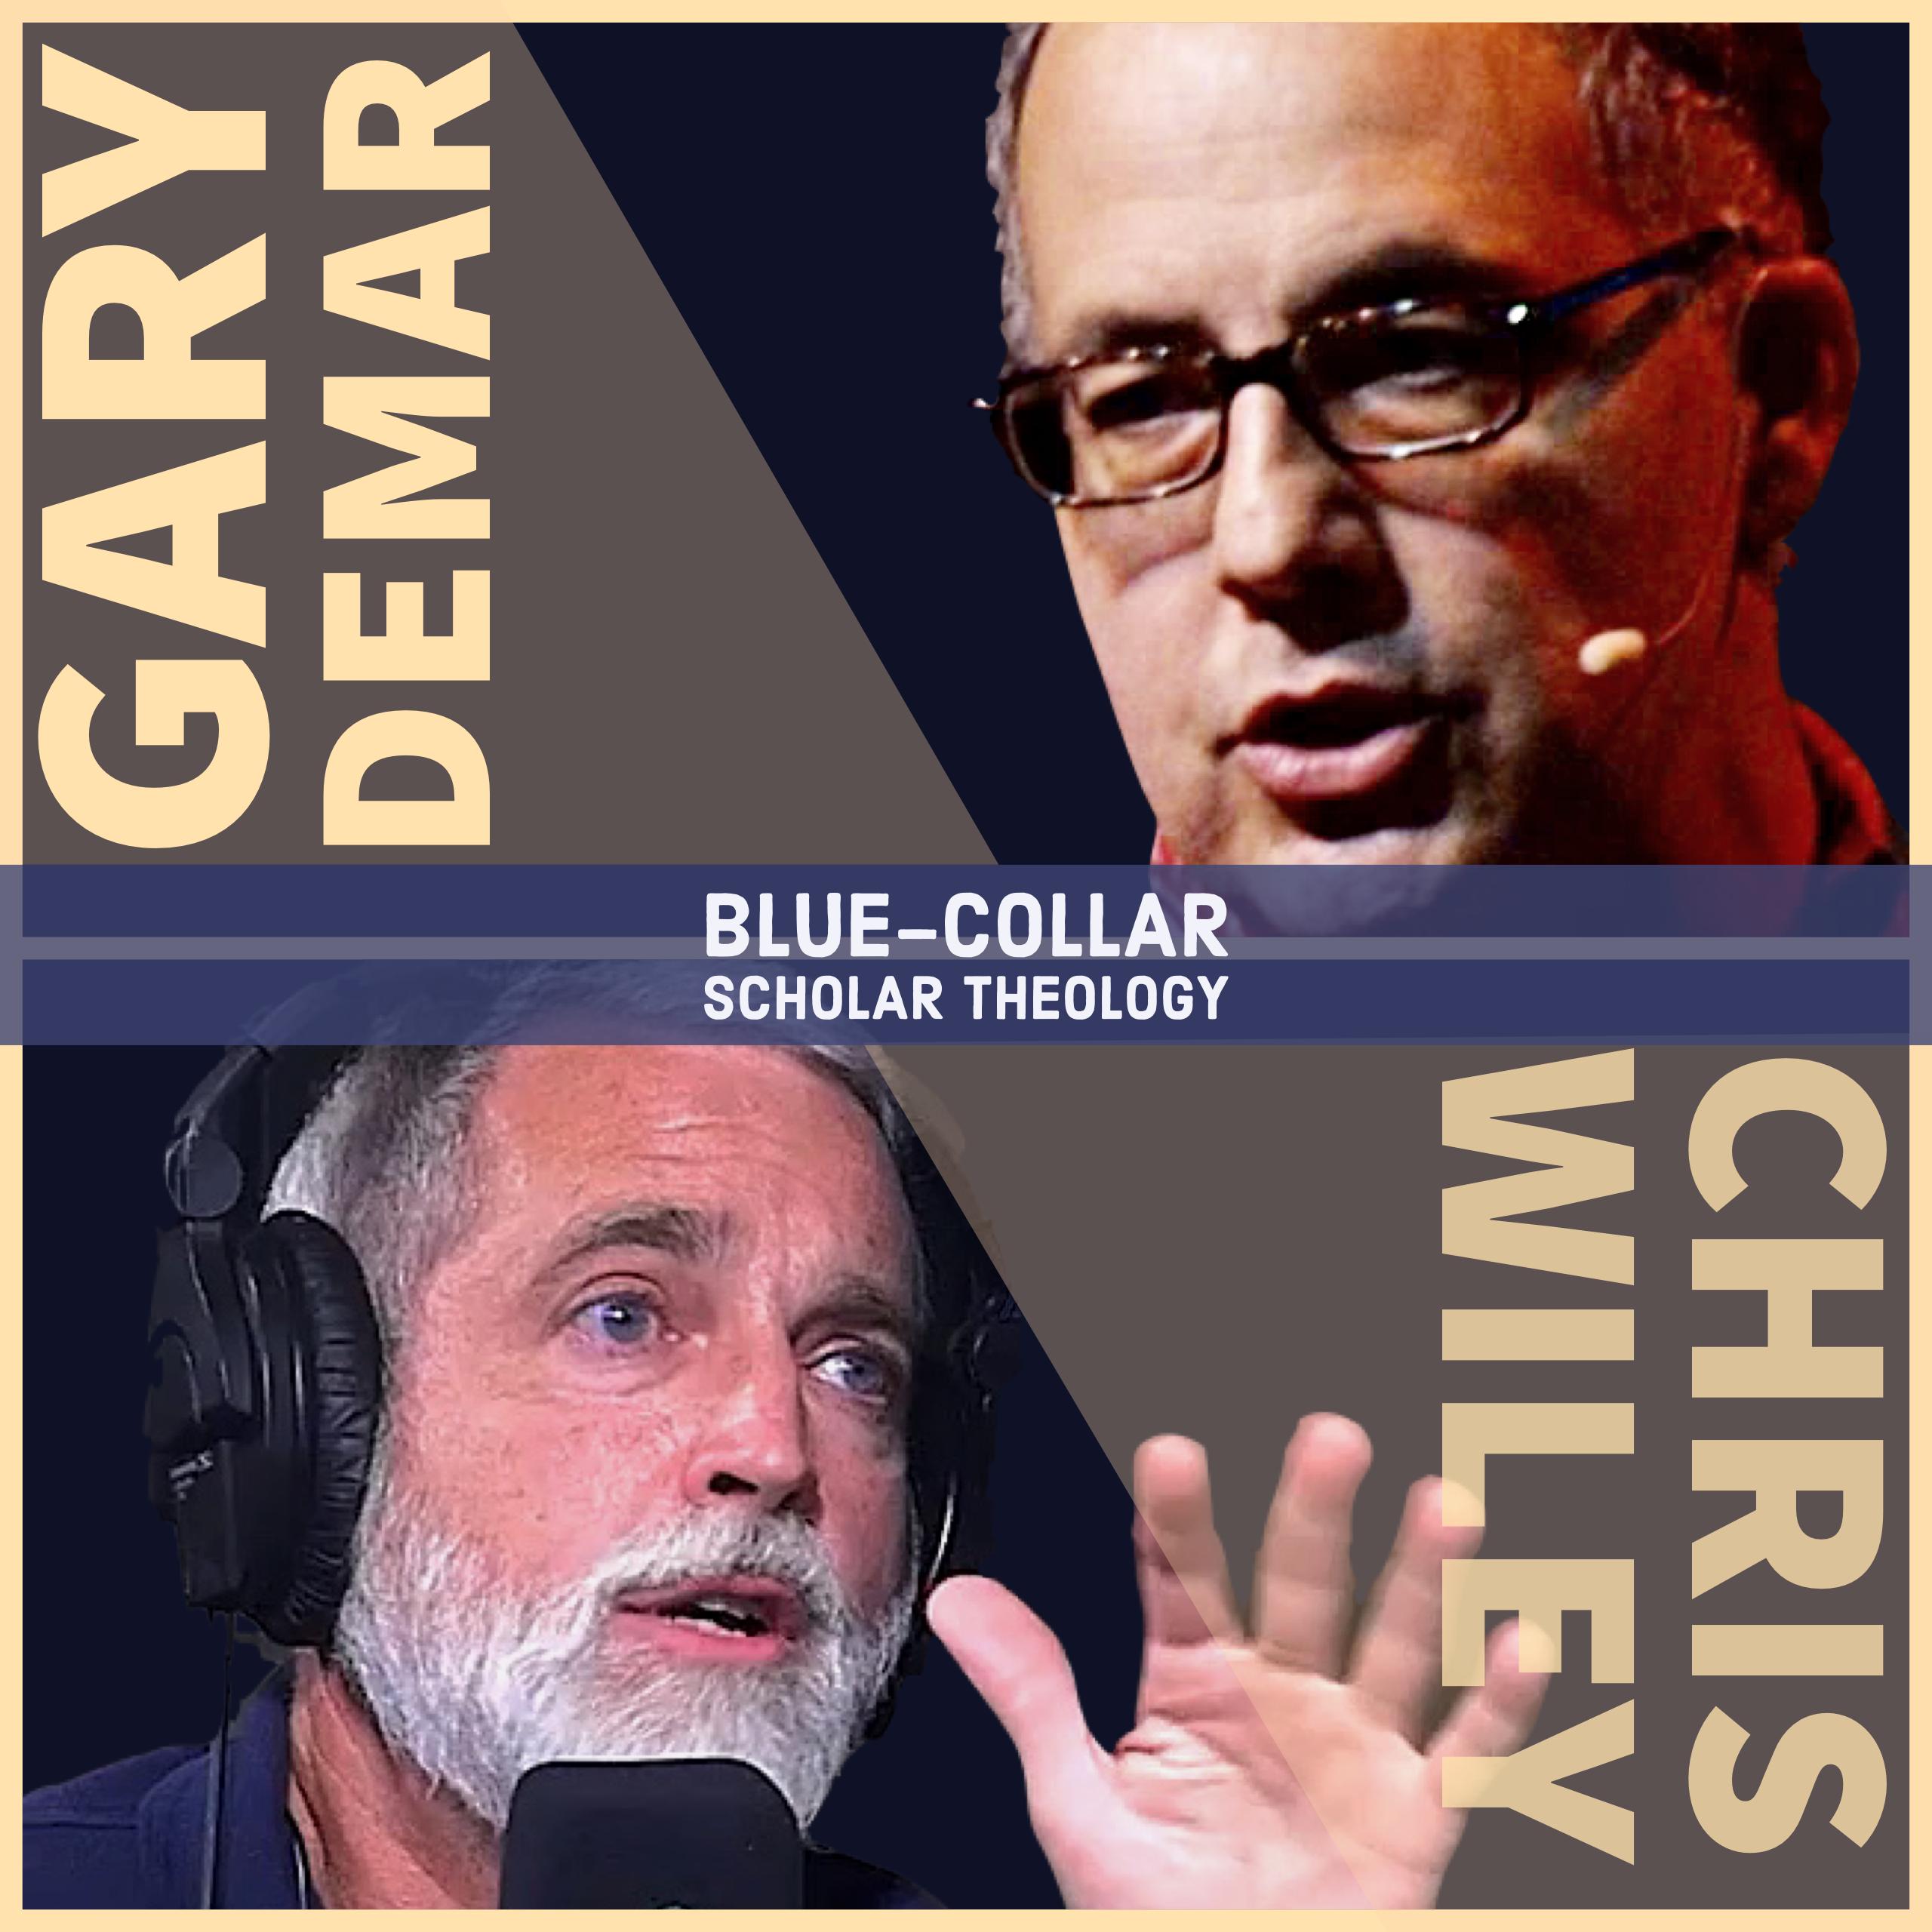 Blue-Collar Scholar Theology